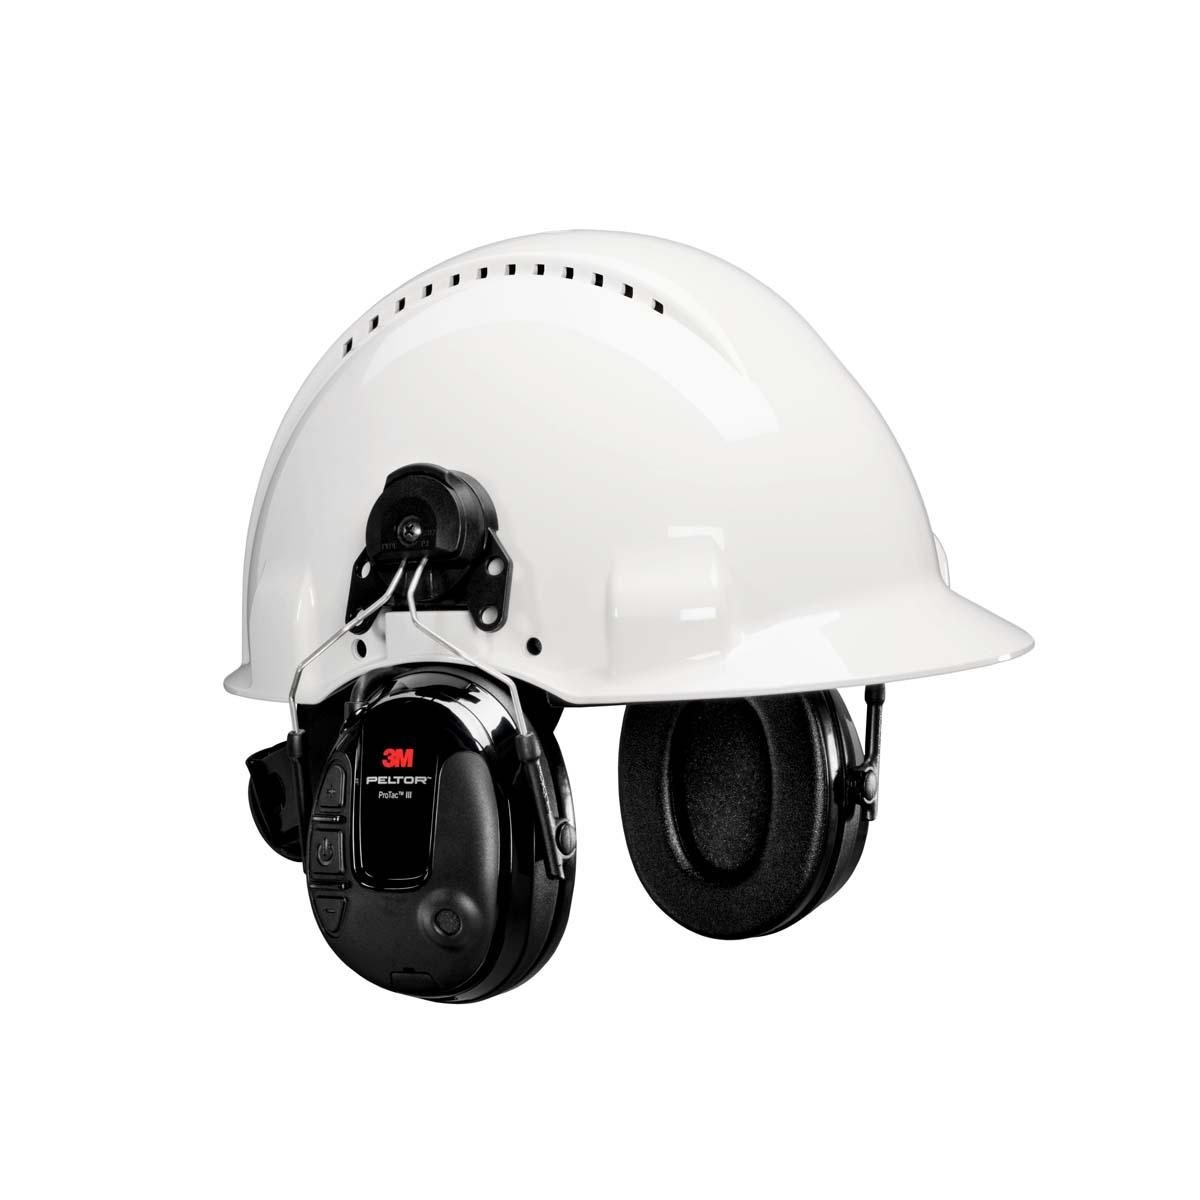 3M PELTOR ProTac III Slim Headset  Black ? Hard Hat Attached